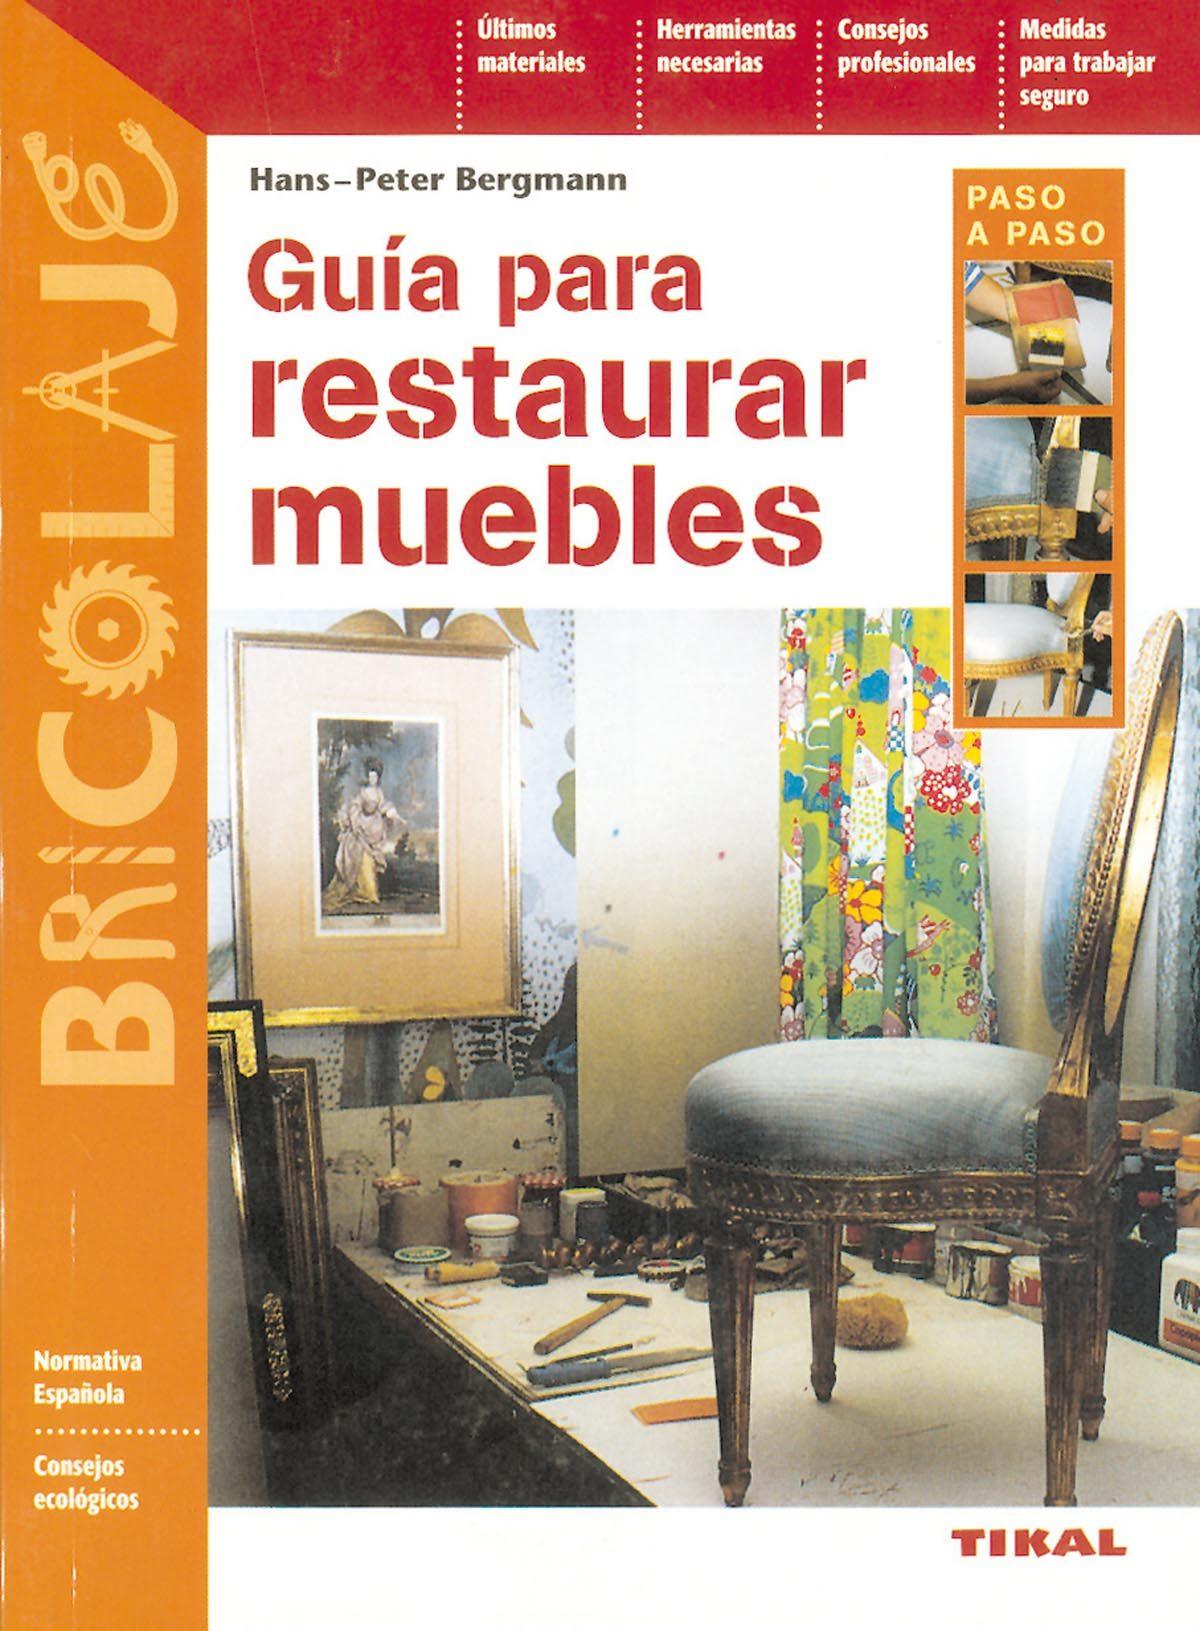 Comprar muebles para restaurar interesting tcnica para - Muebles viejos para restaurar ...